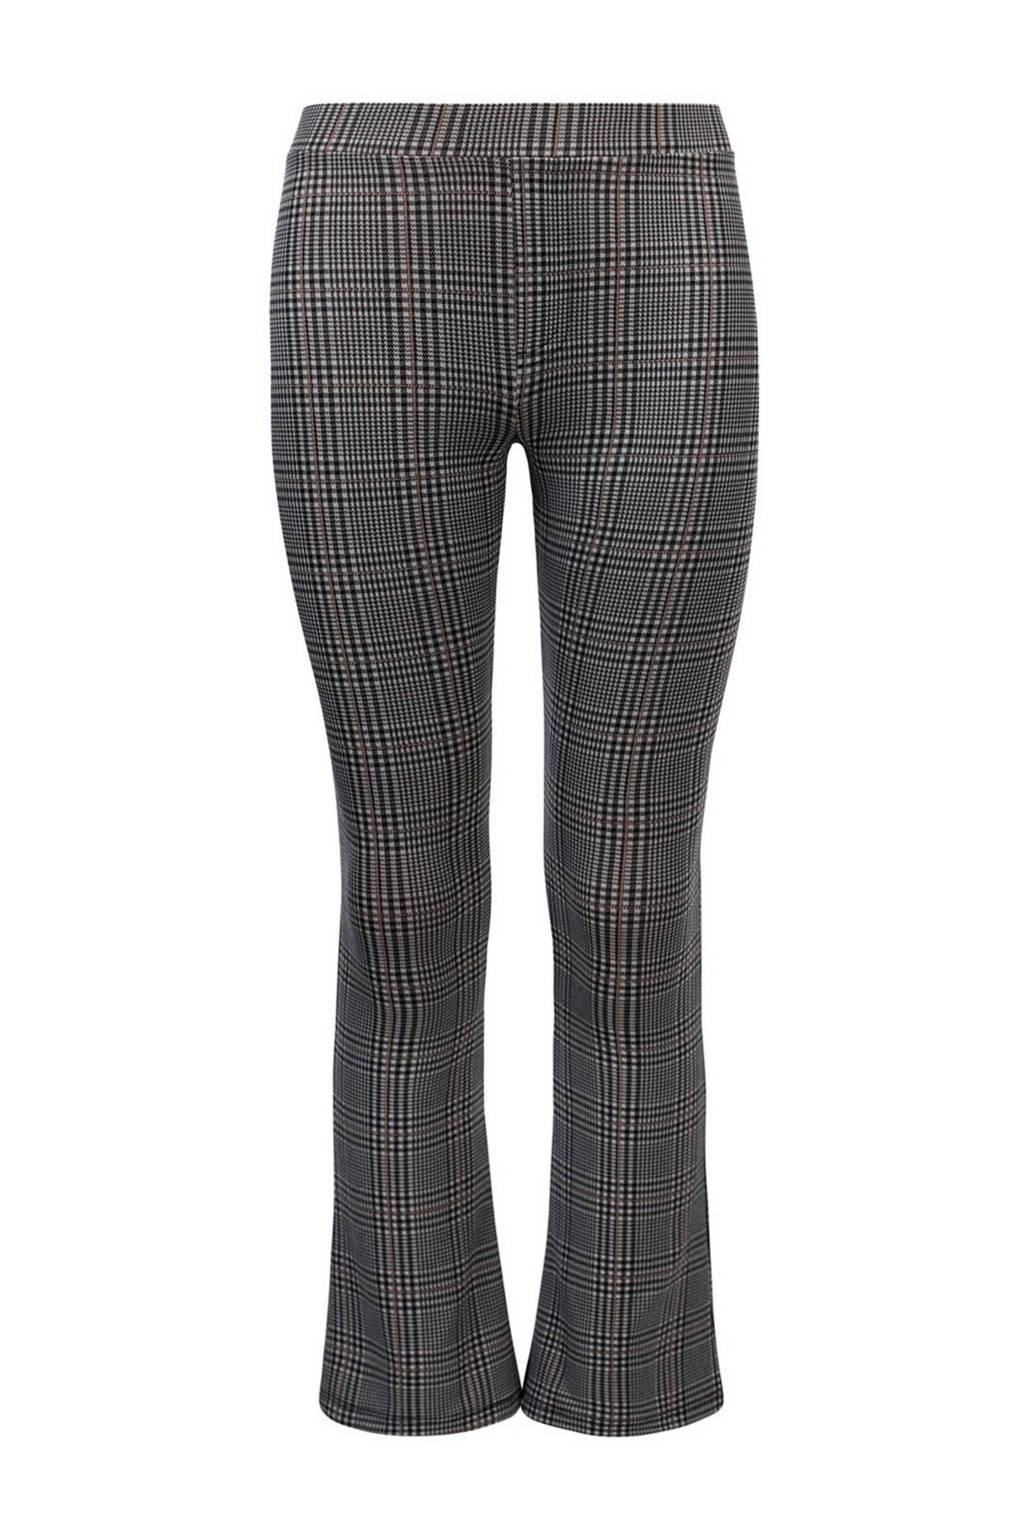 LOOXS 10sixteen geruite flared broek grijs/zwart, Grijs/zwart